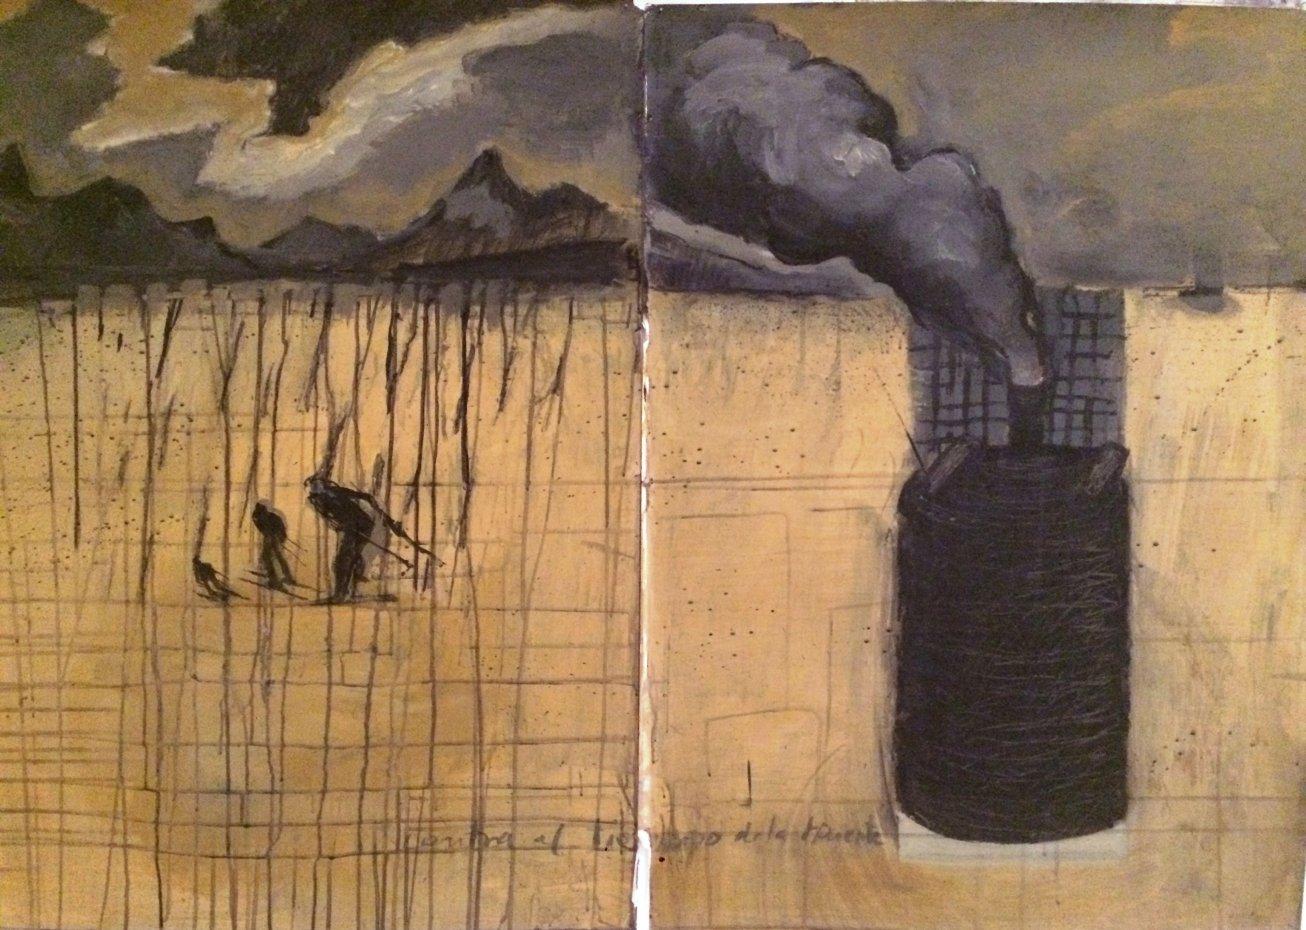 La muerte cae del cielo (2014) - Rafael Alvarado